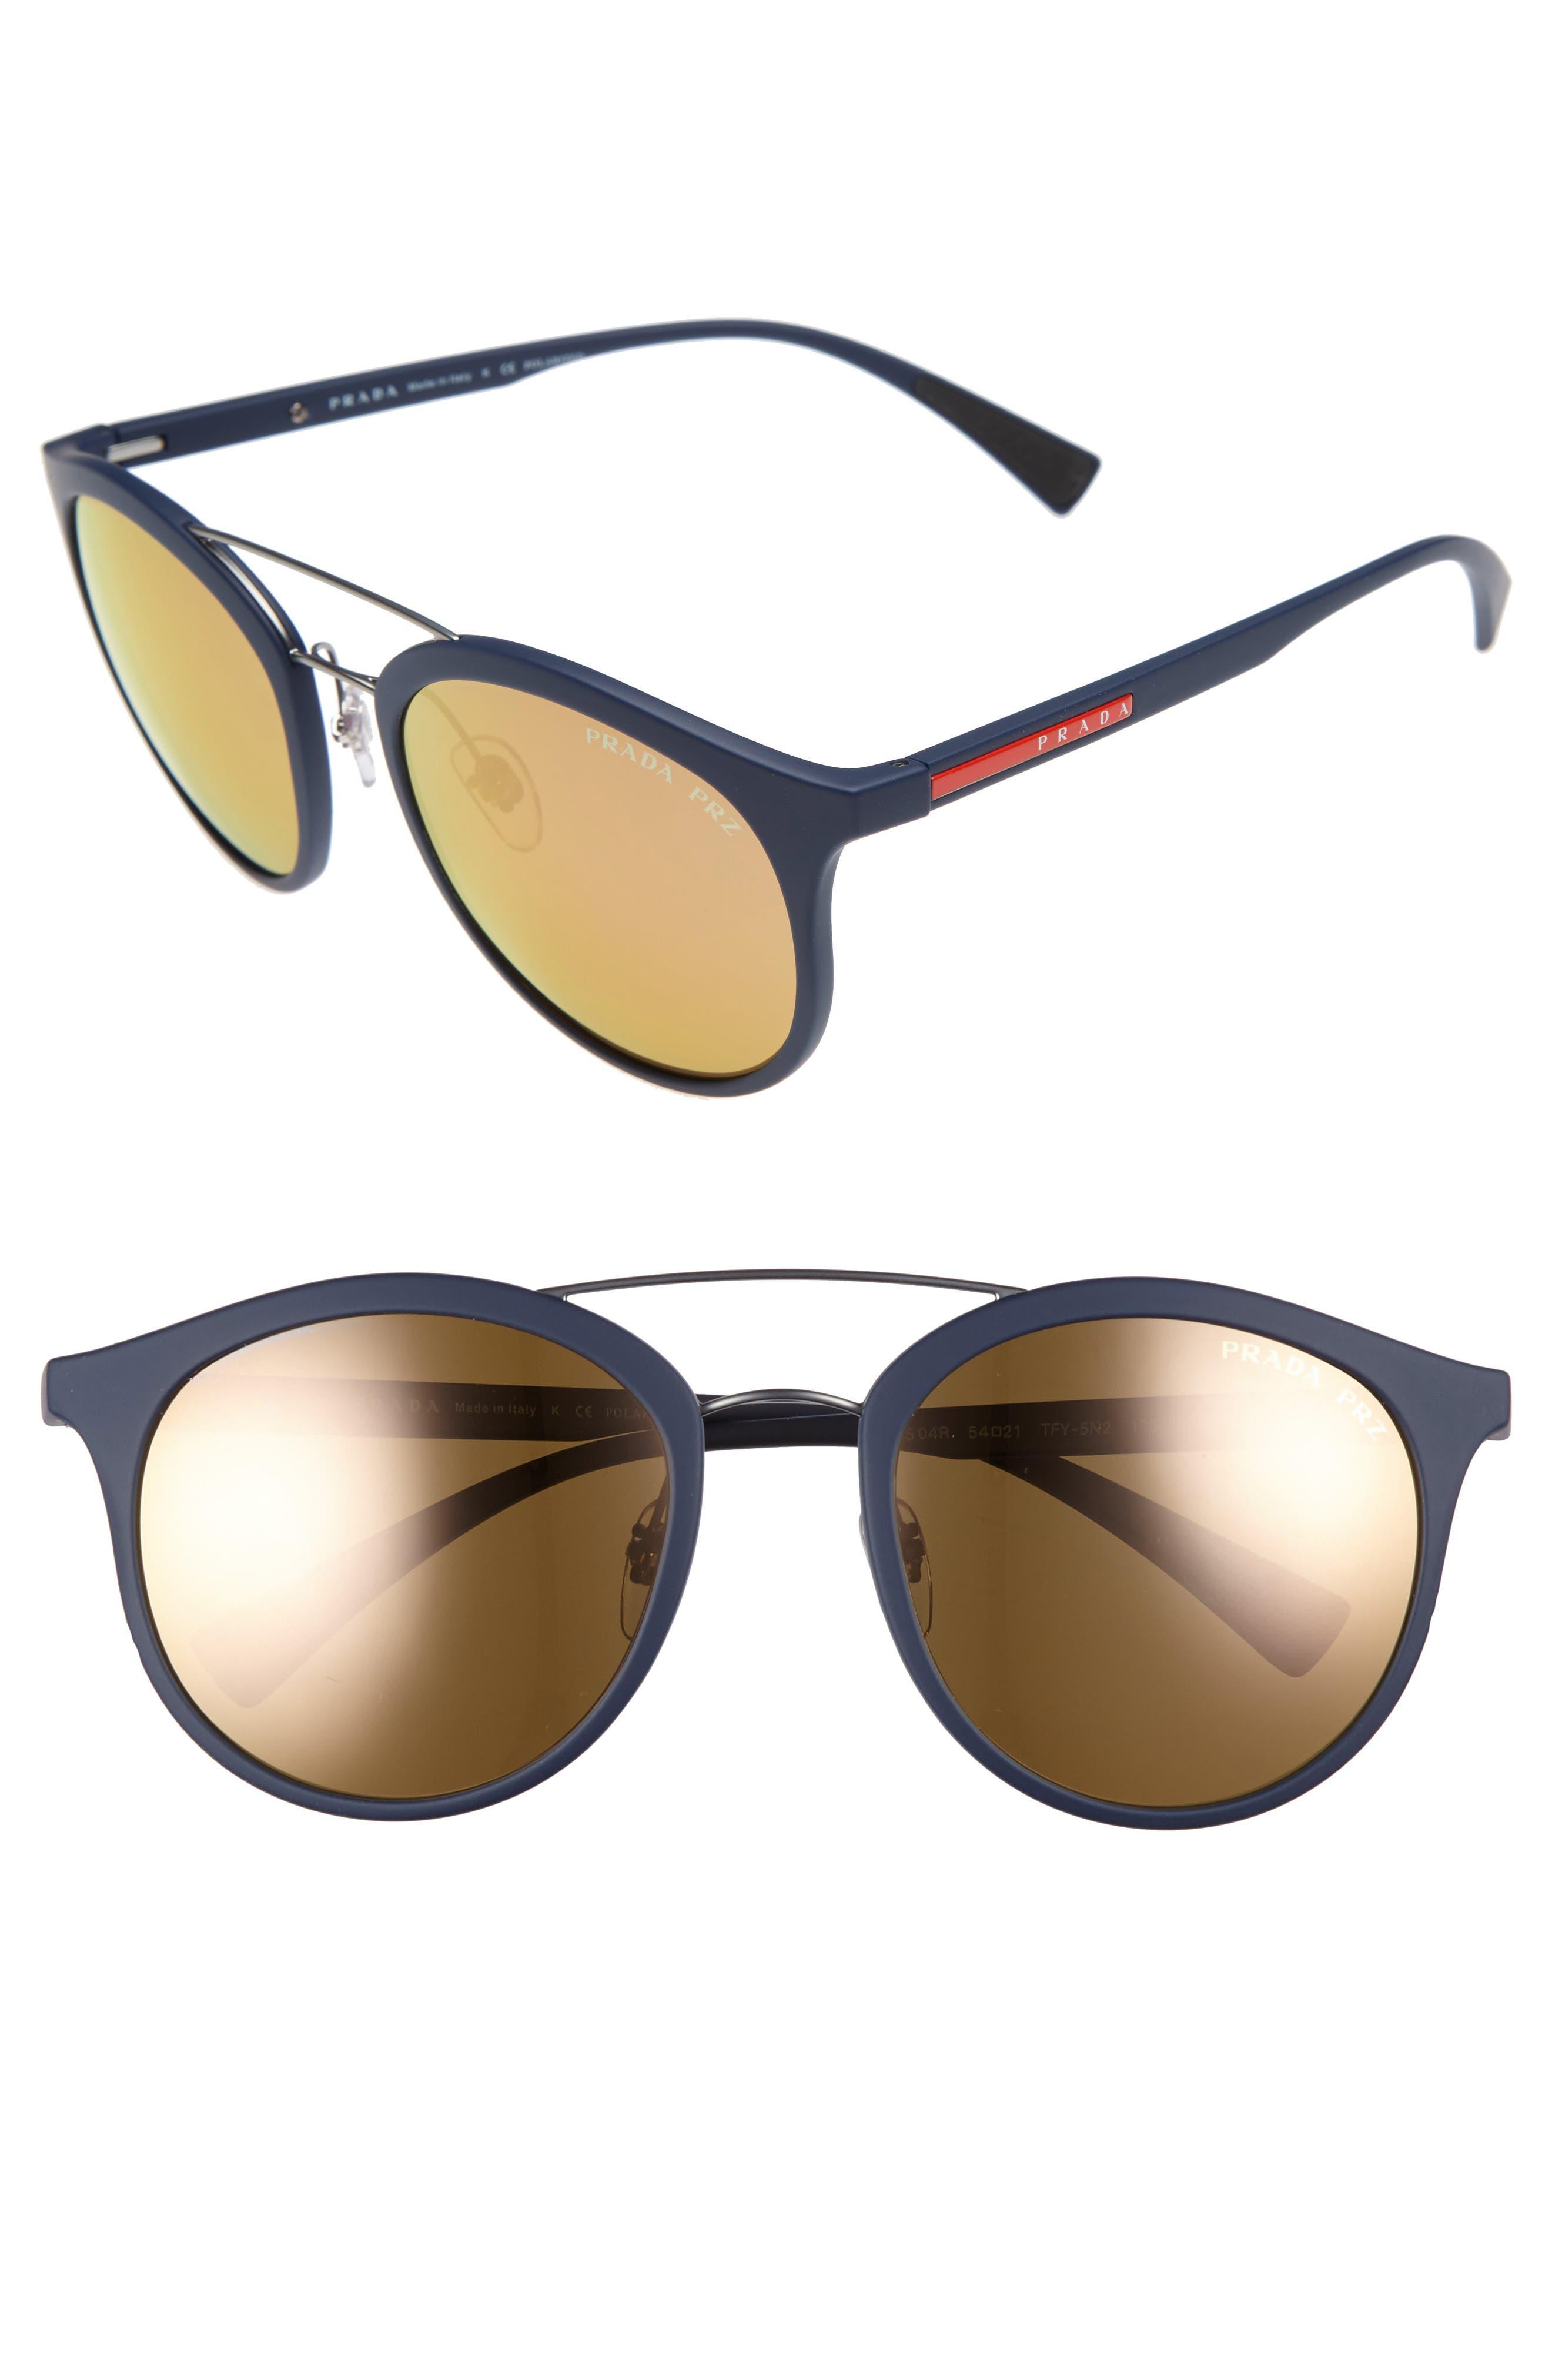 Alternate Image 1 Selected - Prada 54mm Polarized Round Sunglasses